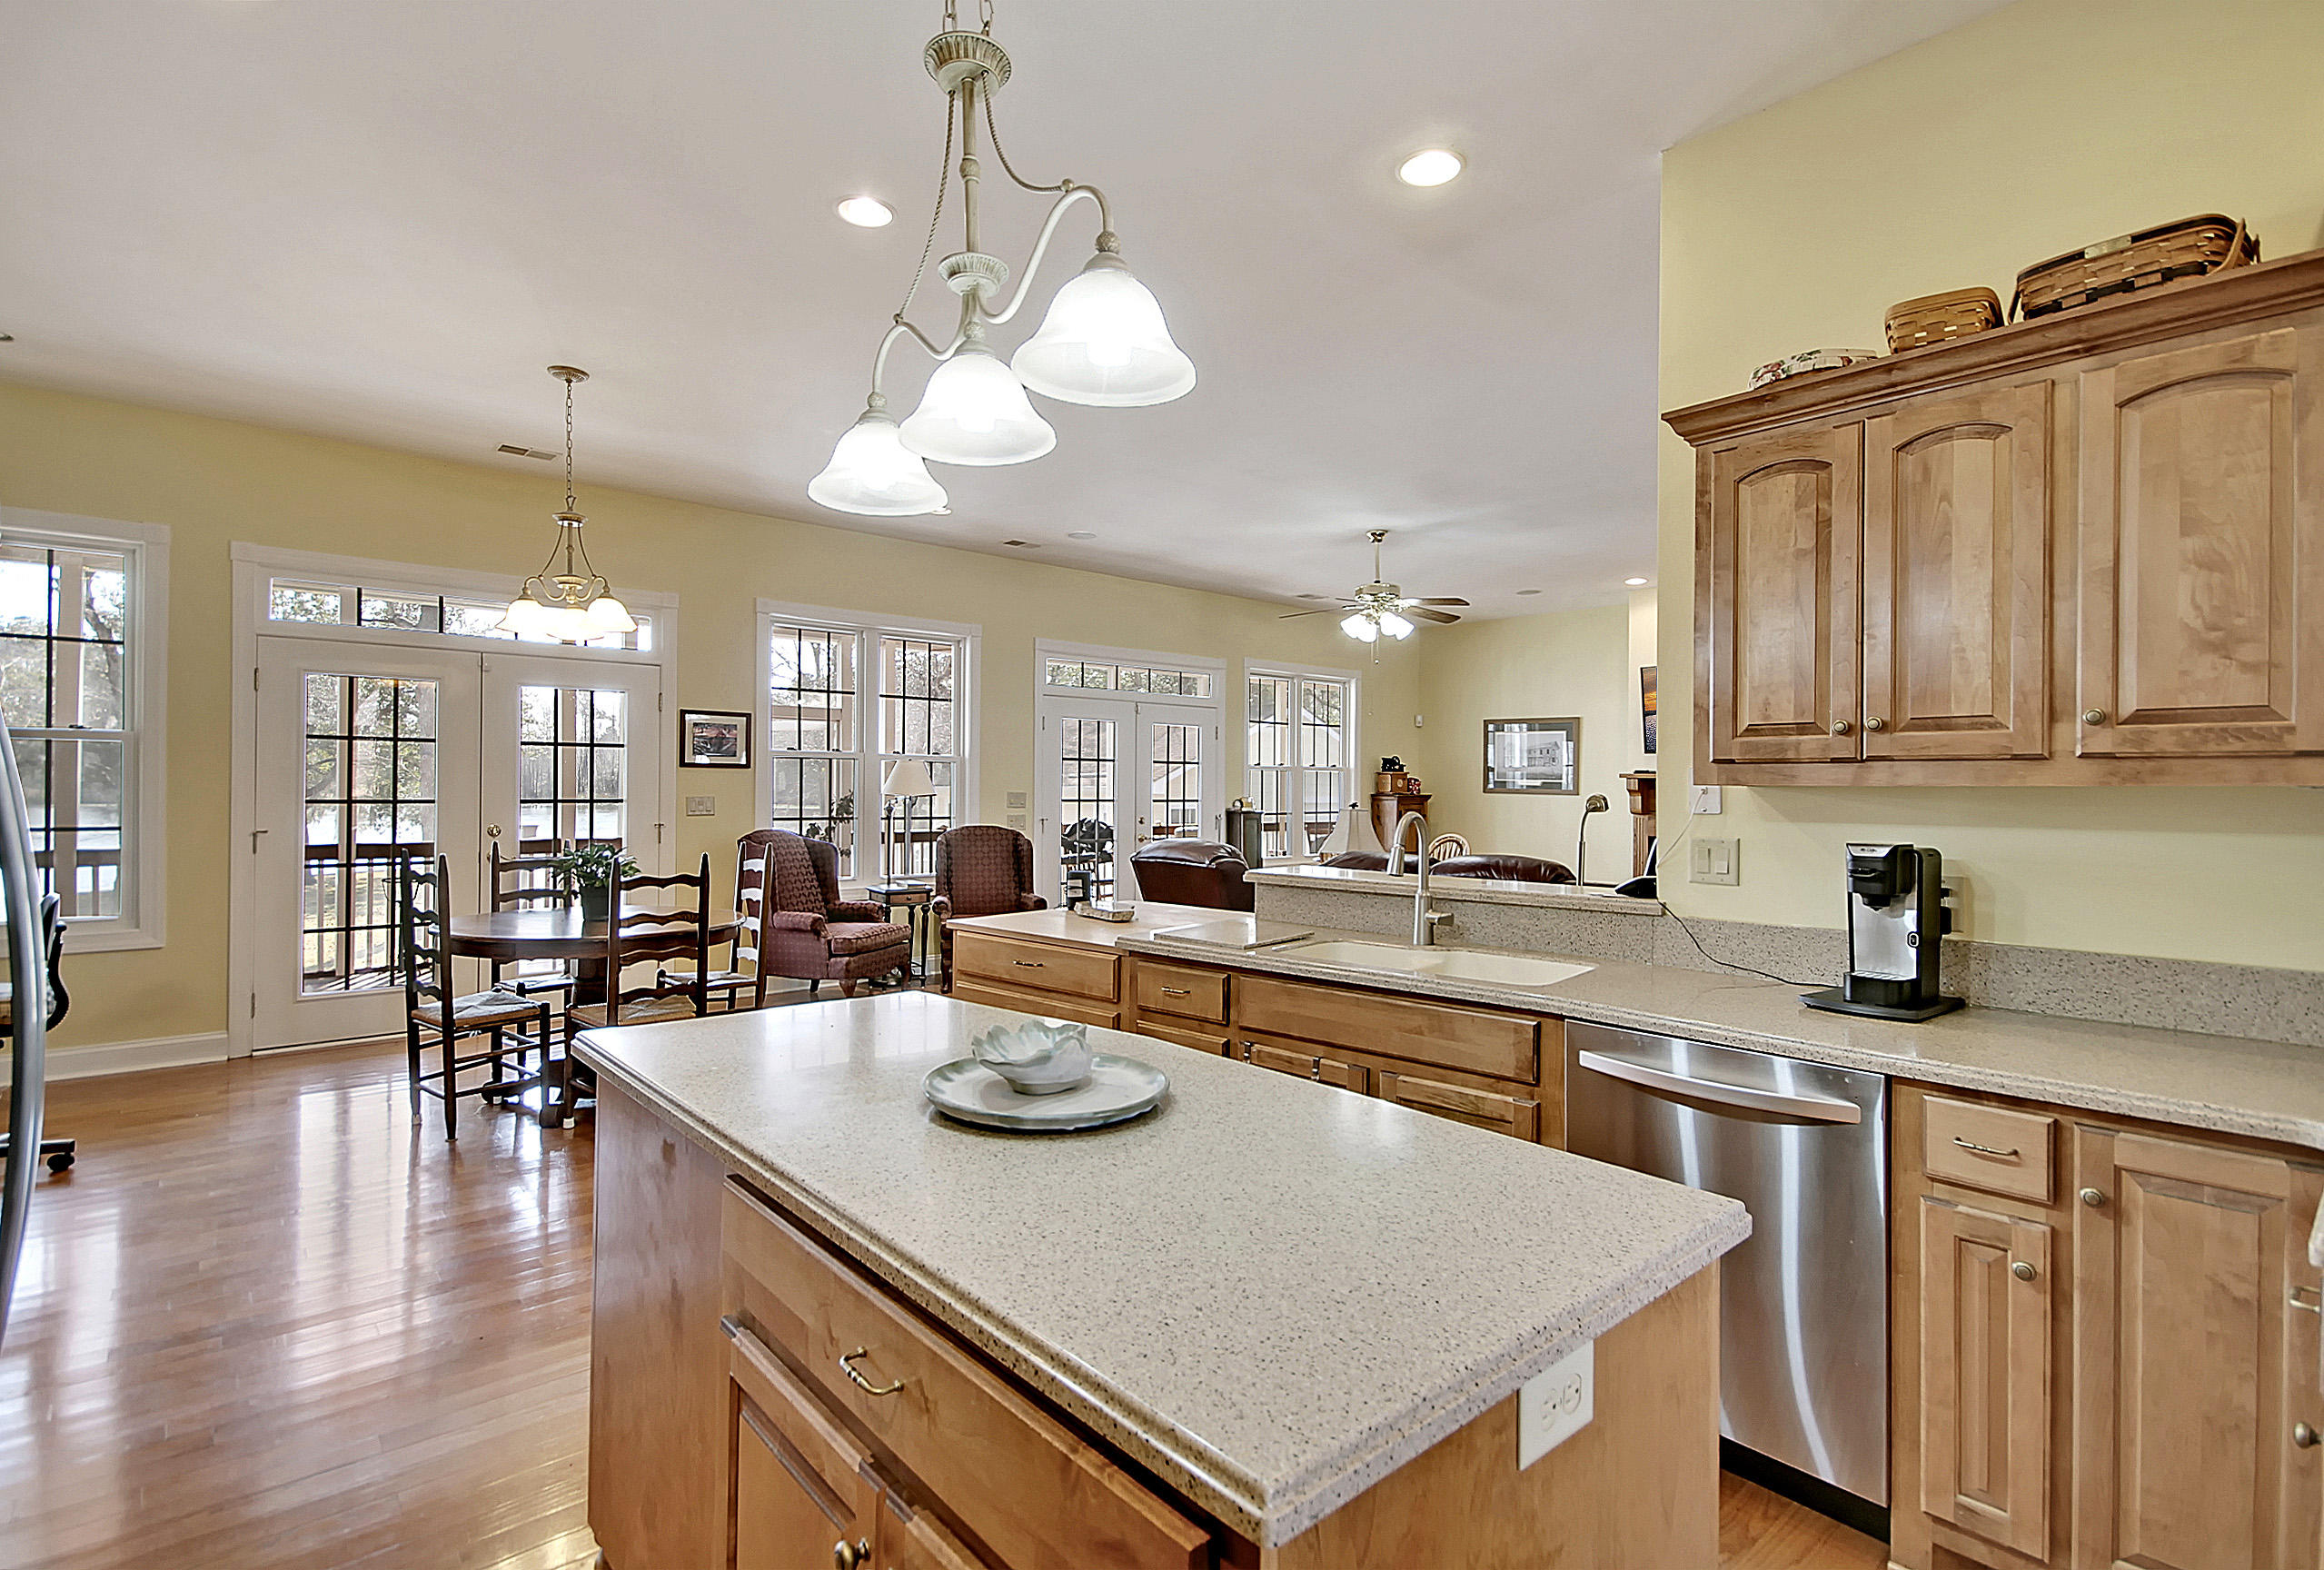 Cross Subd (Longpoint) Homes For Sale - 1191 Longpoint, Cross, SC - 11